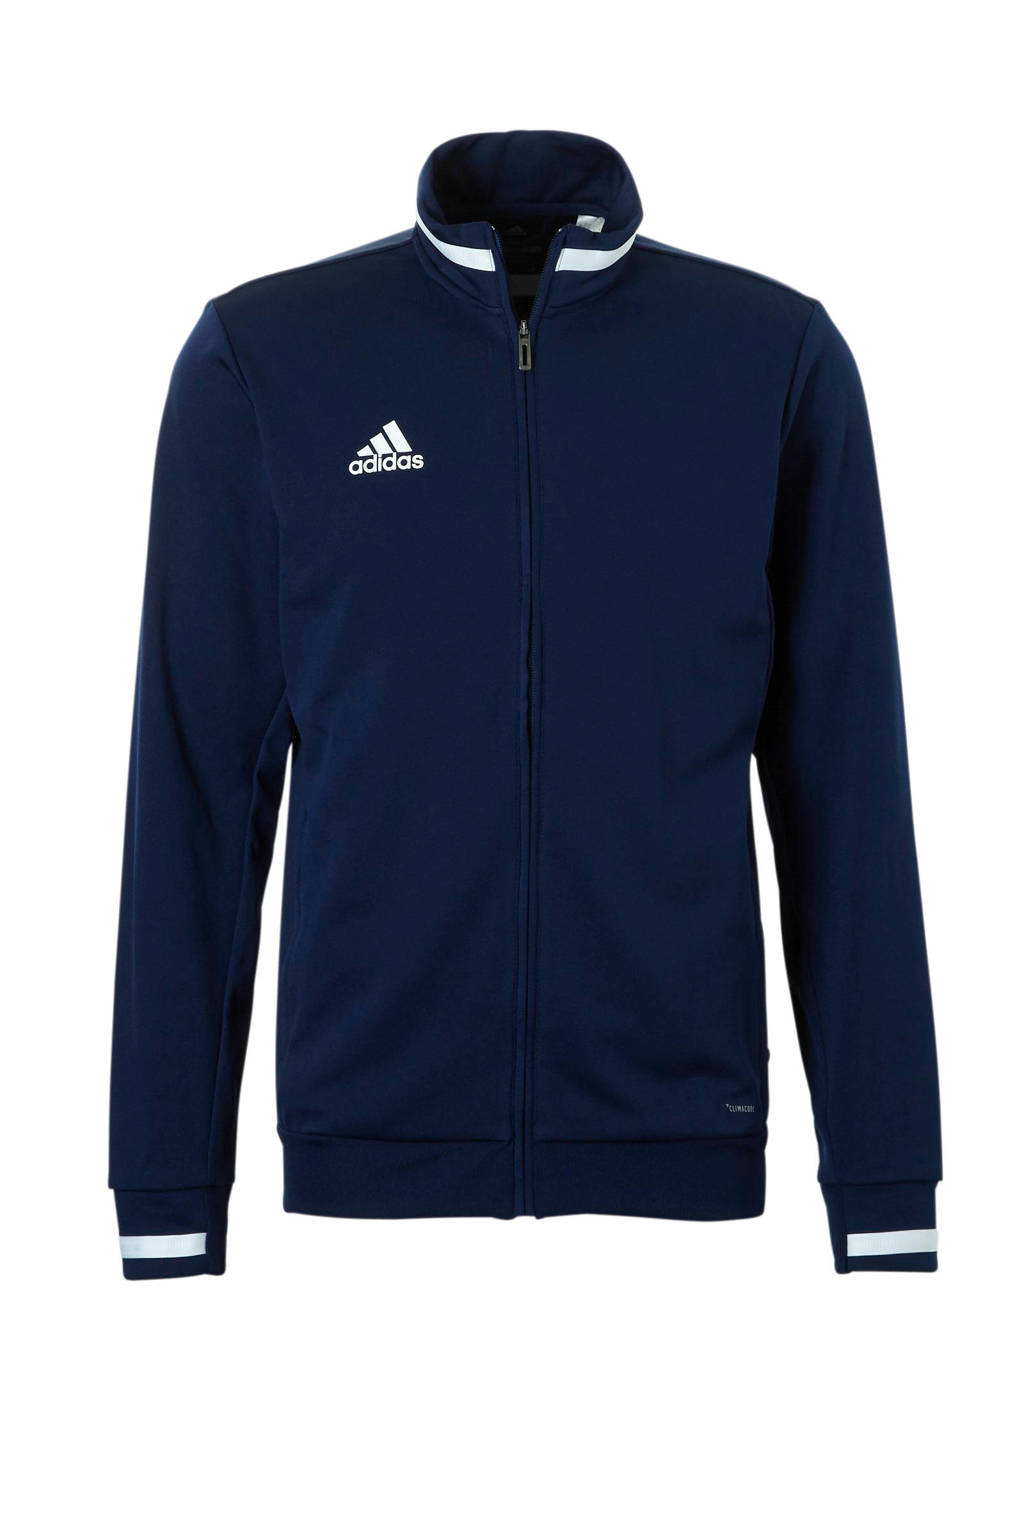 adidas Performance   sportvest T19 donkerblauw, Donkerblauw